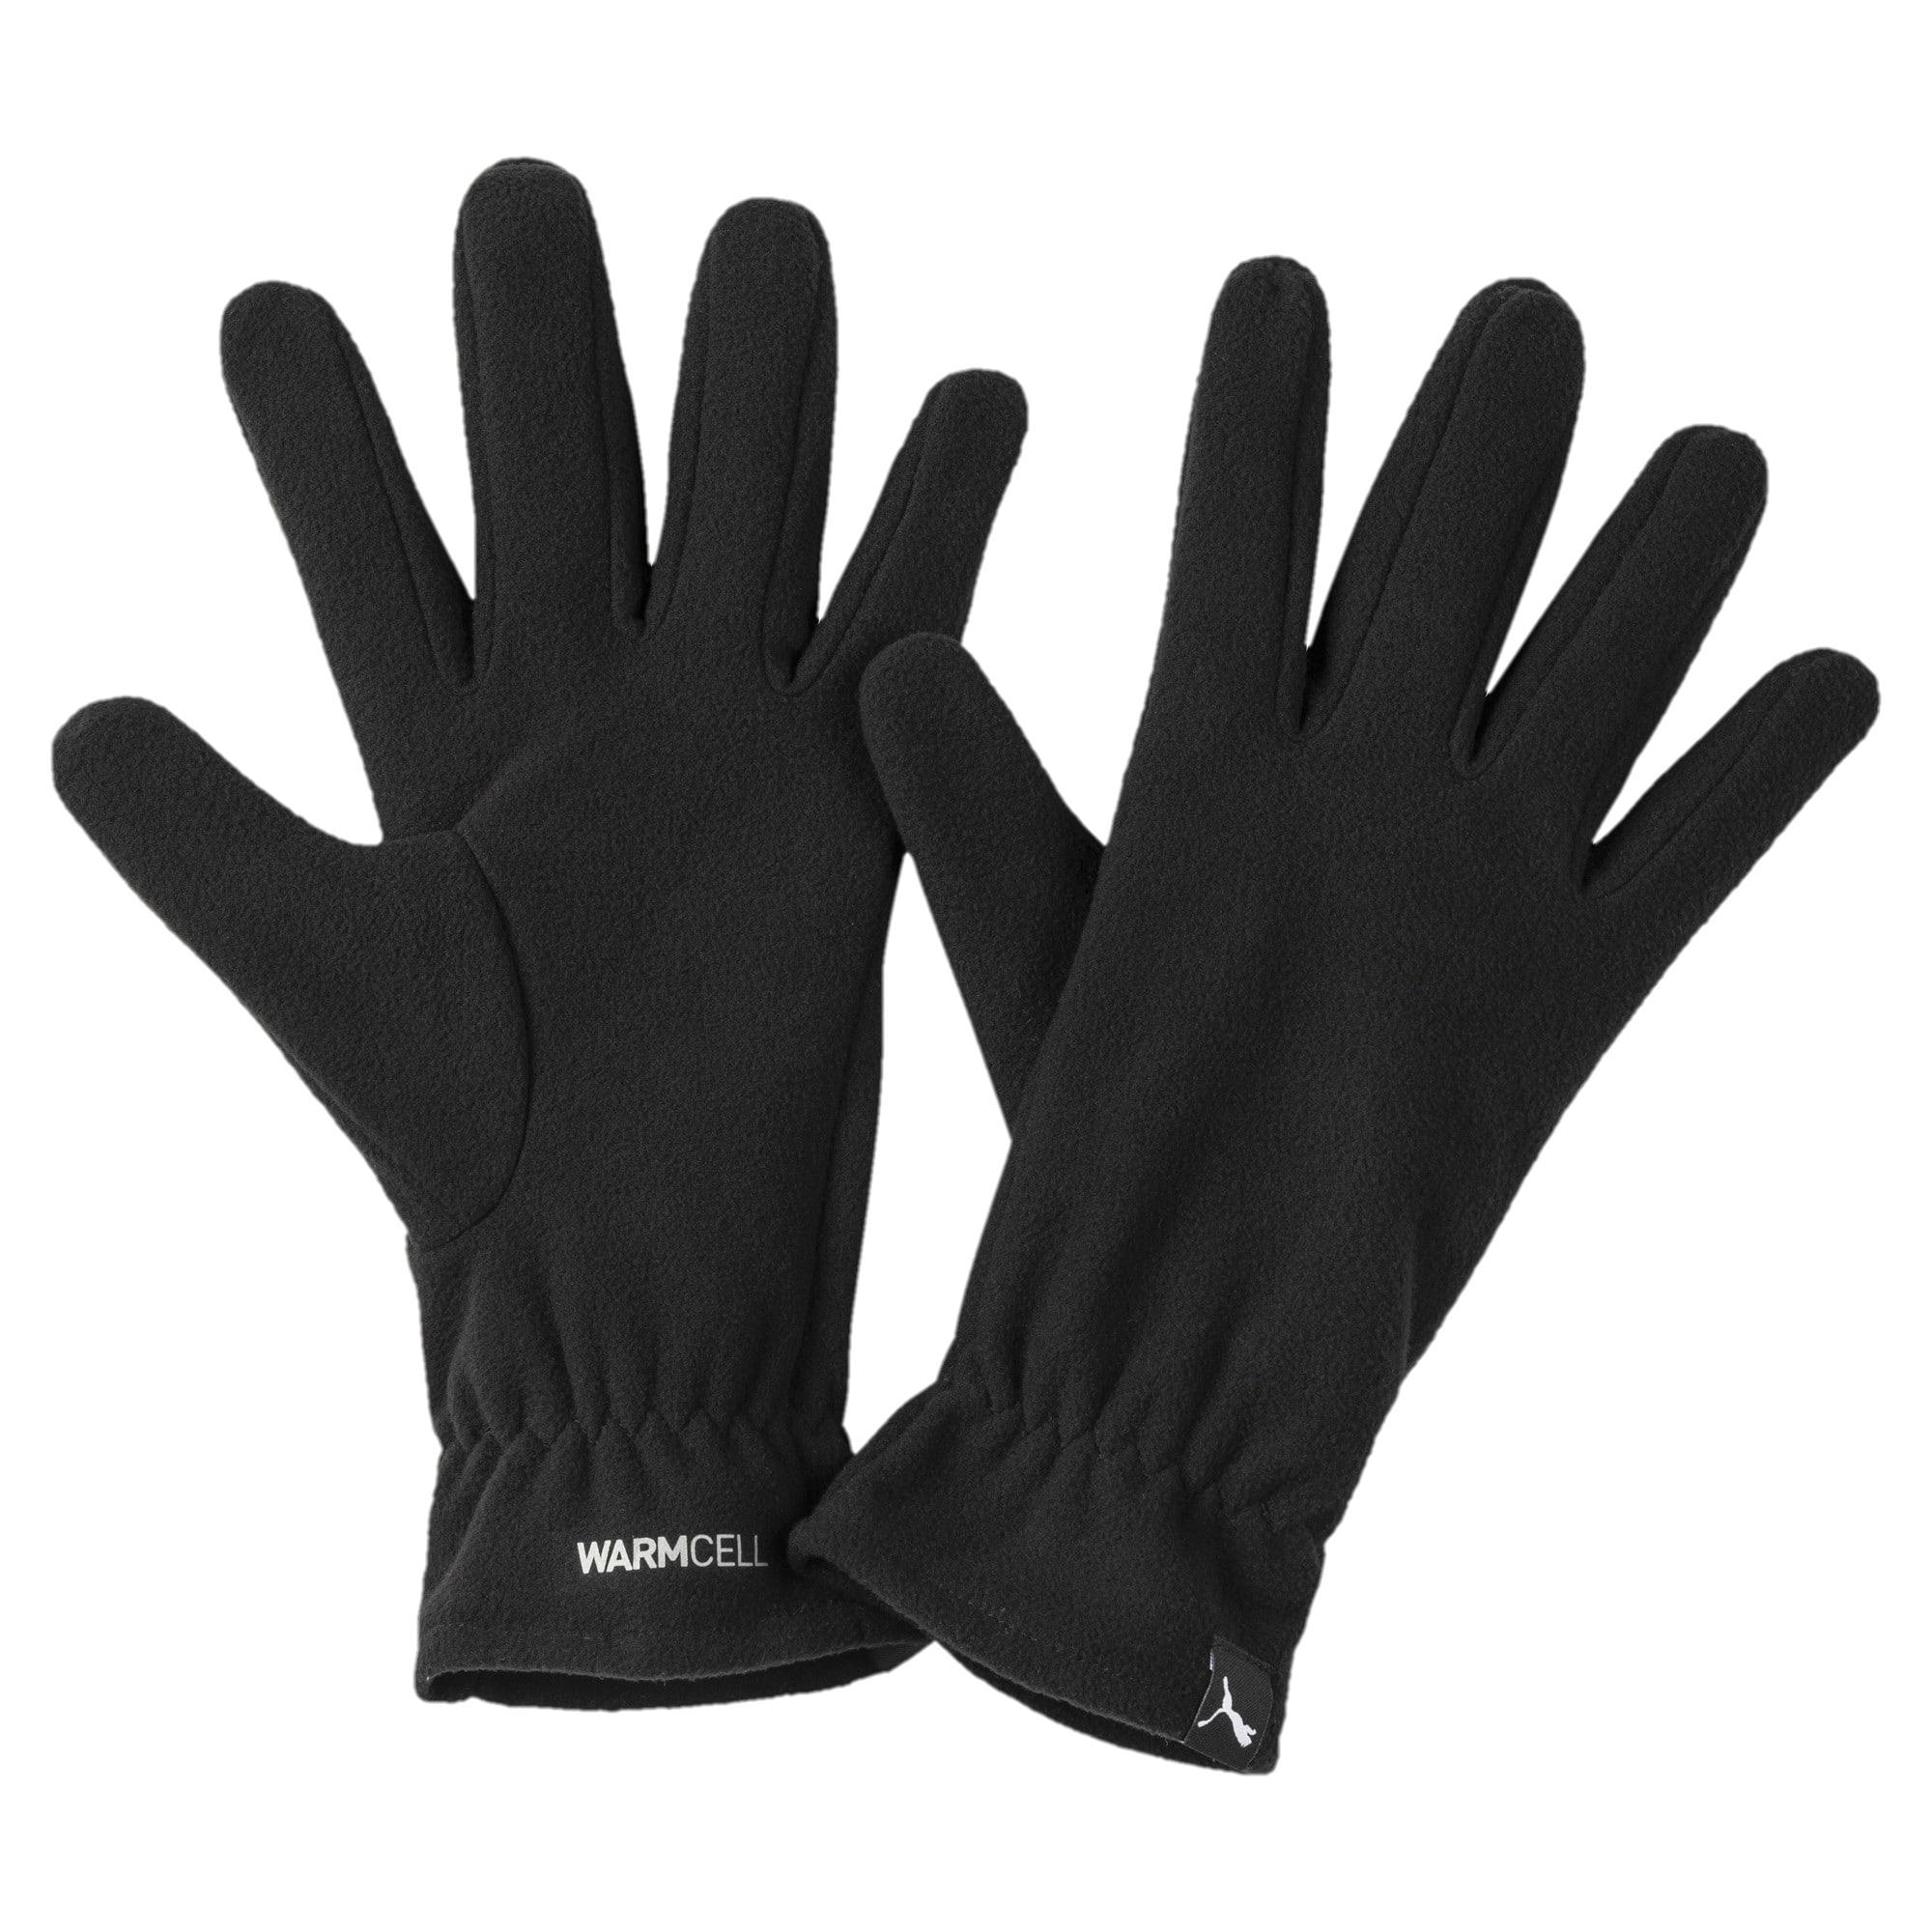 Thumbnail 1 of warmCELL Fleece Gloves, Puma Black, medium-IND